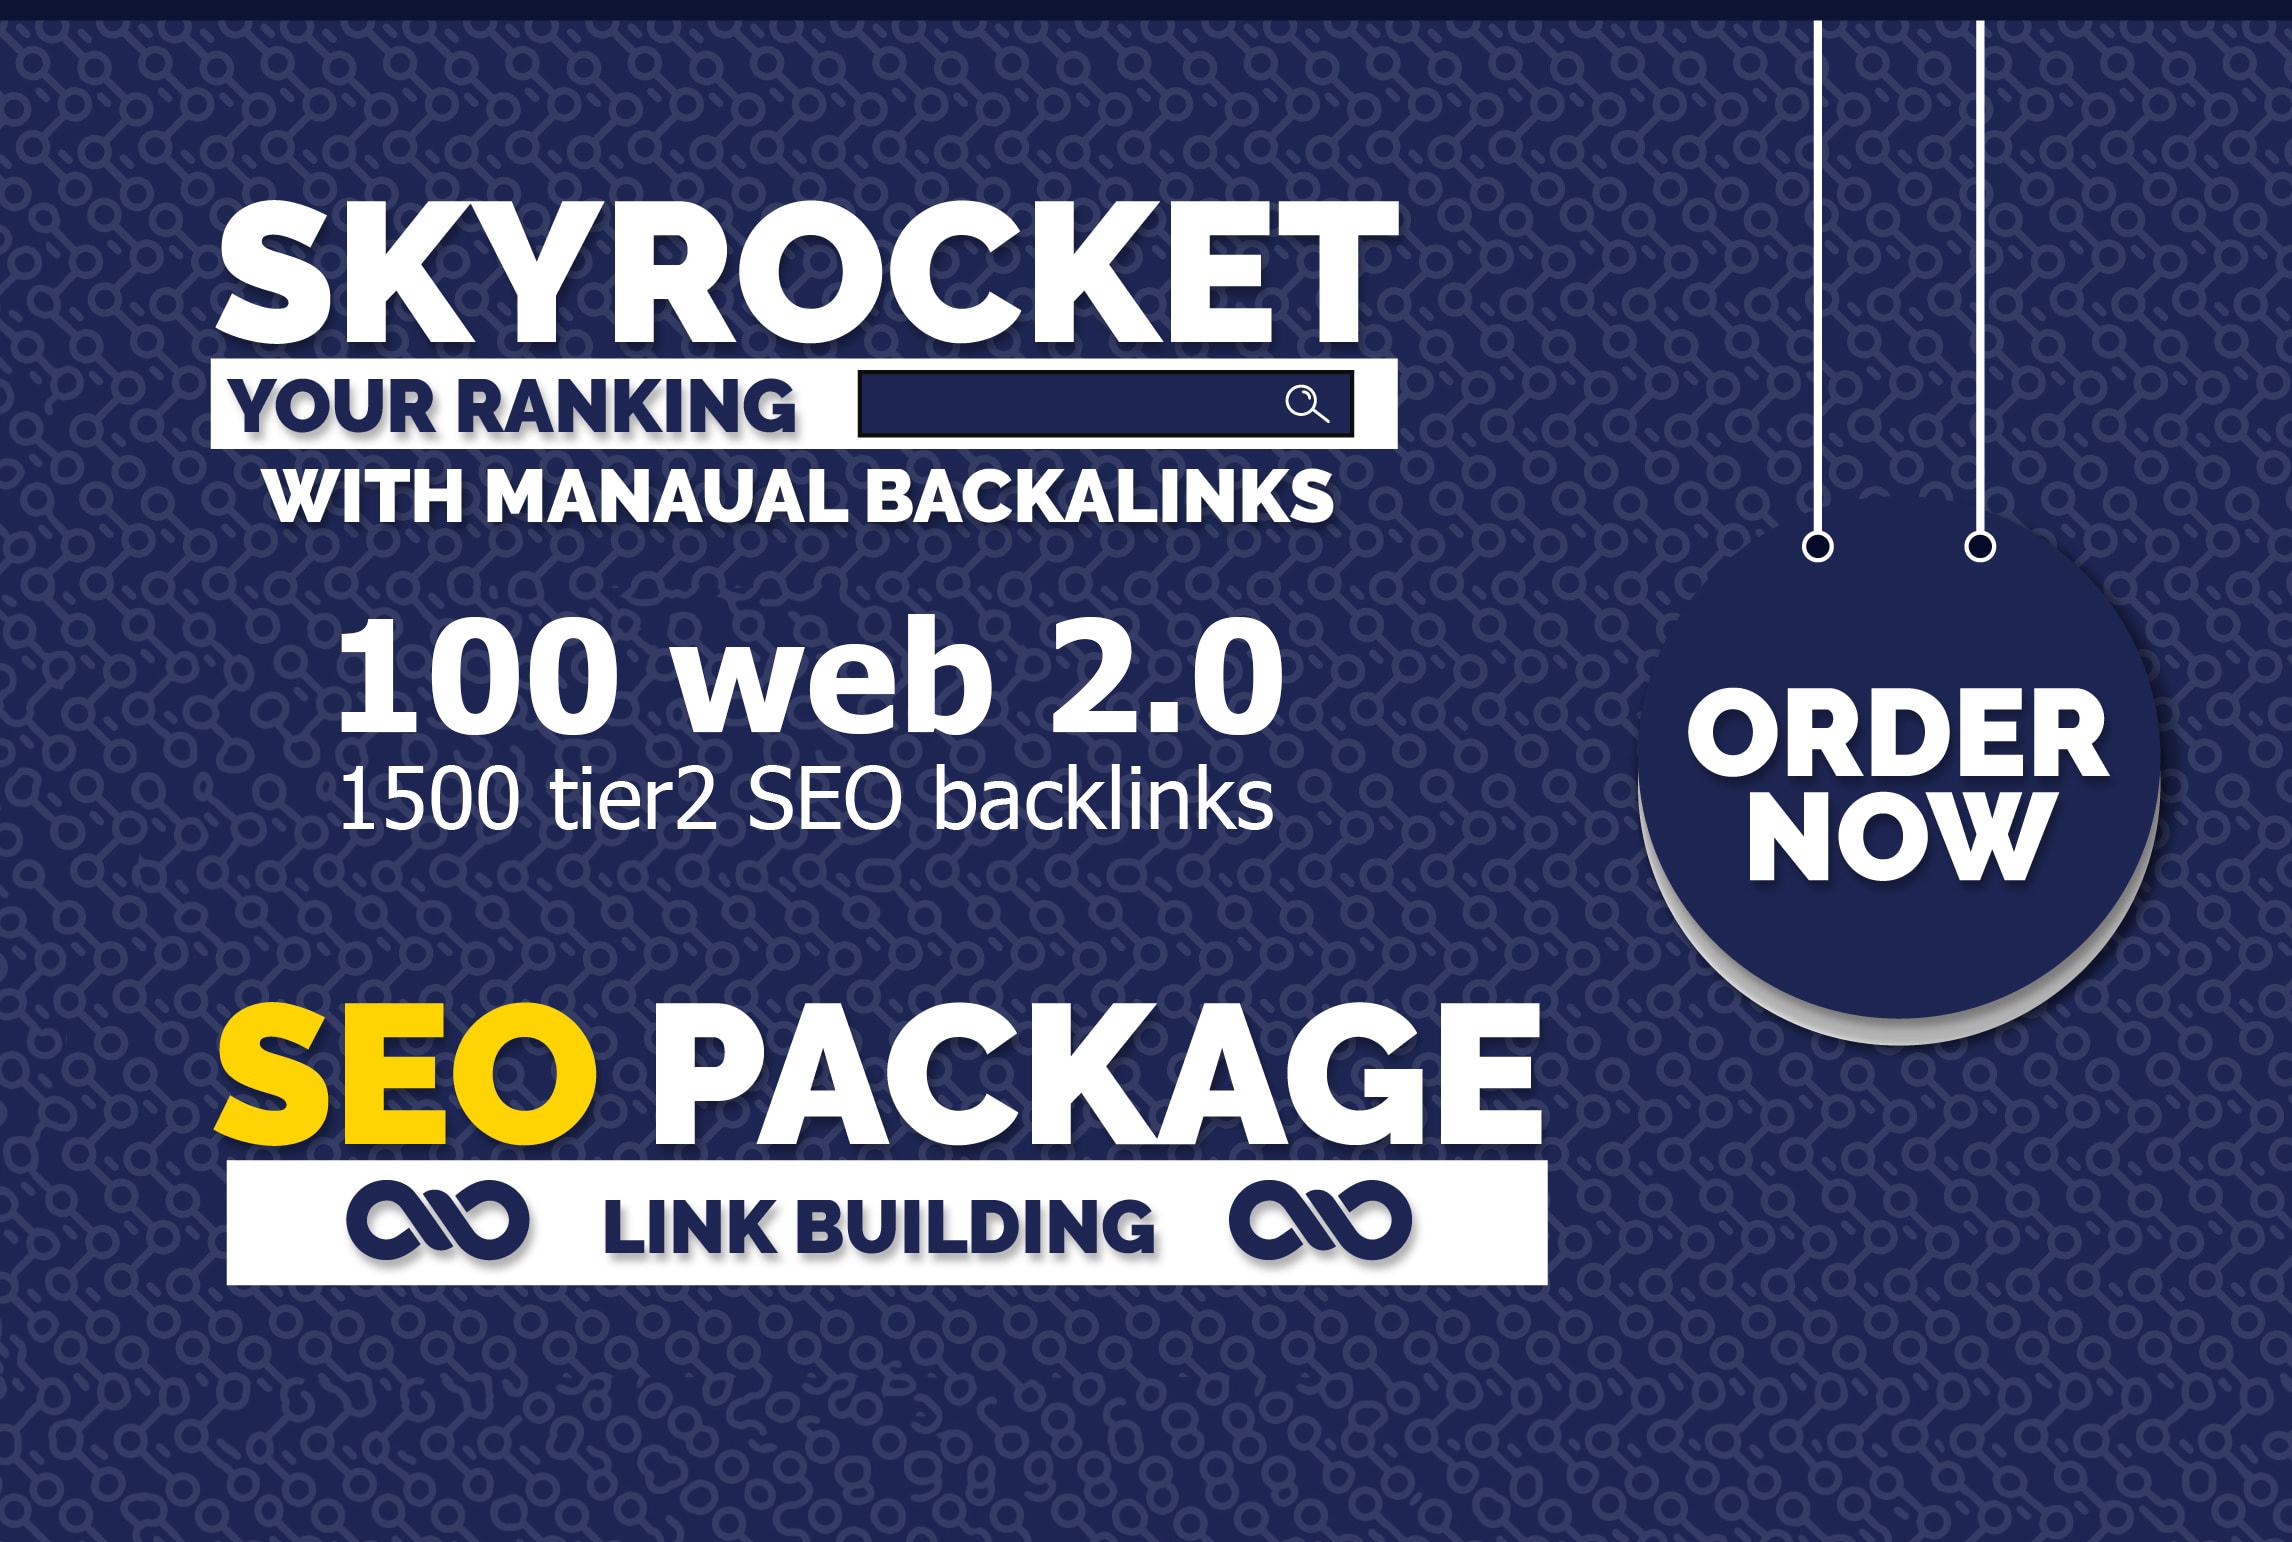 100 web 2.0 link building,  1500 tier2 SEO backlinks